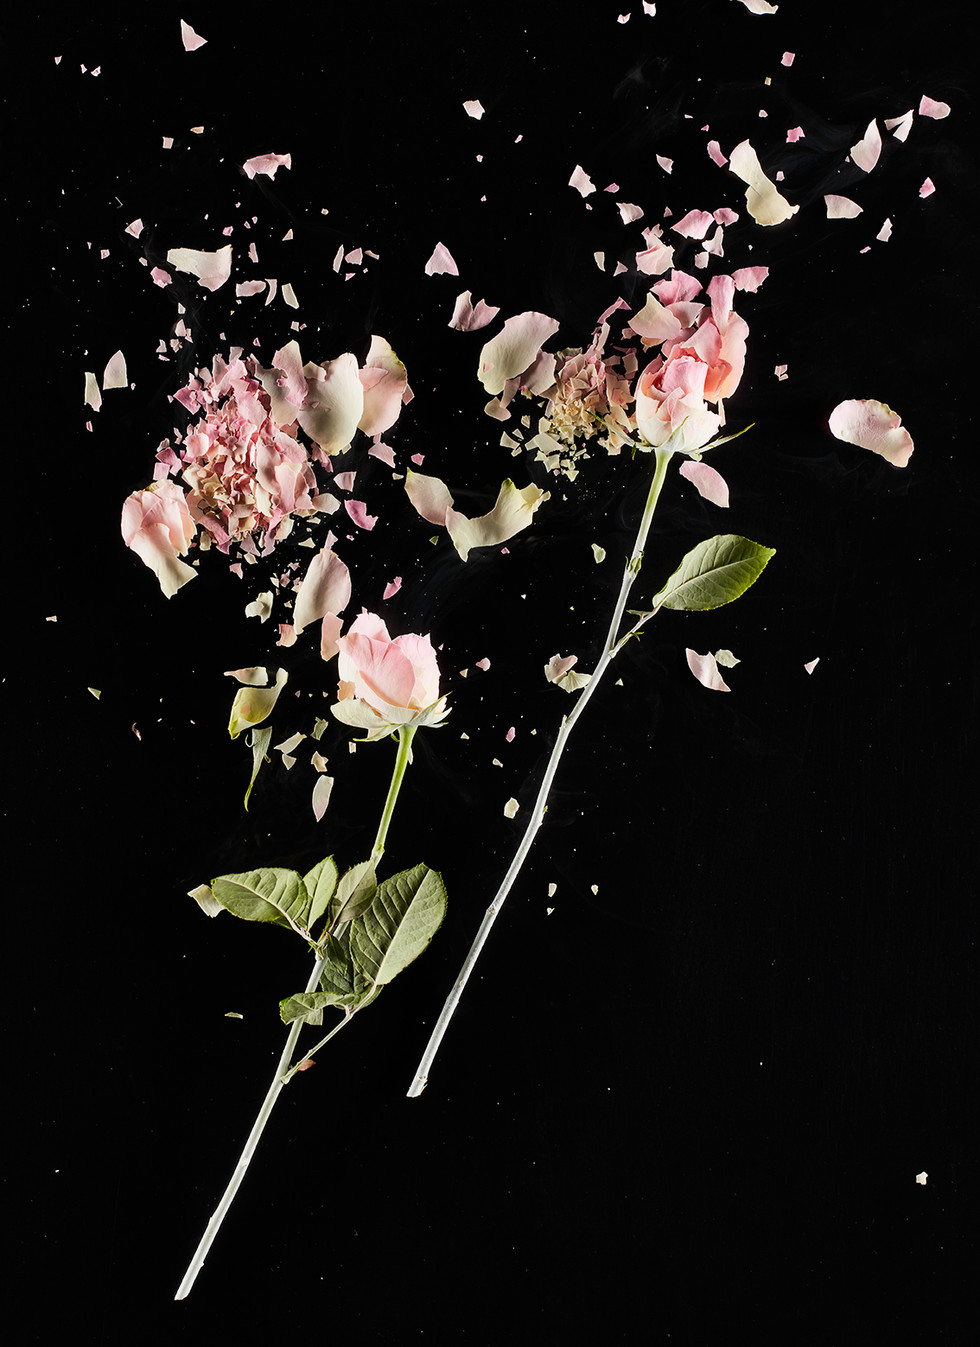 Daniele-Bozzano_CrioFlowers-Roserosa